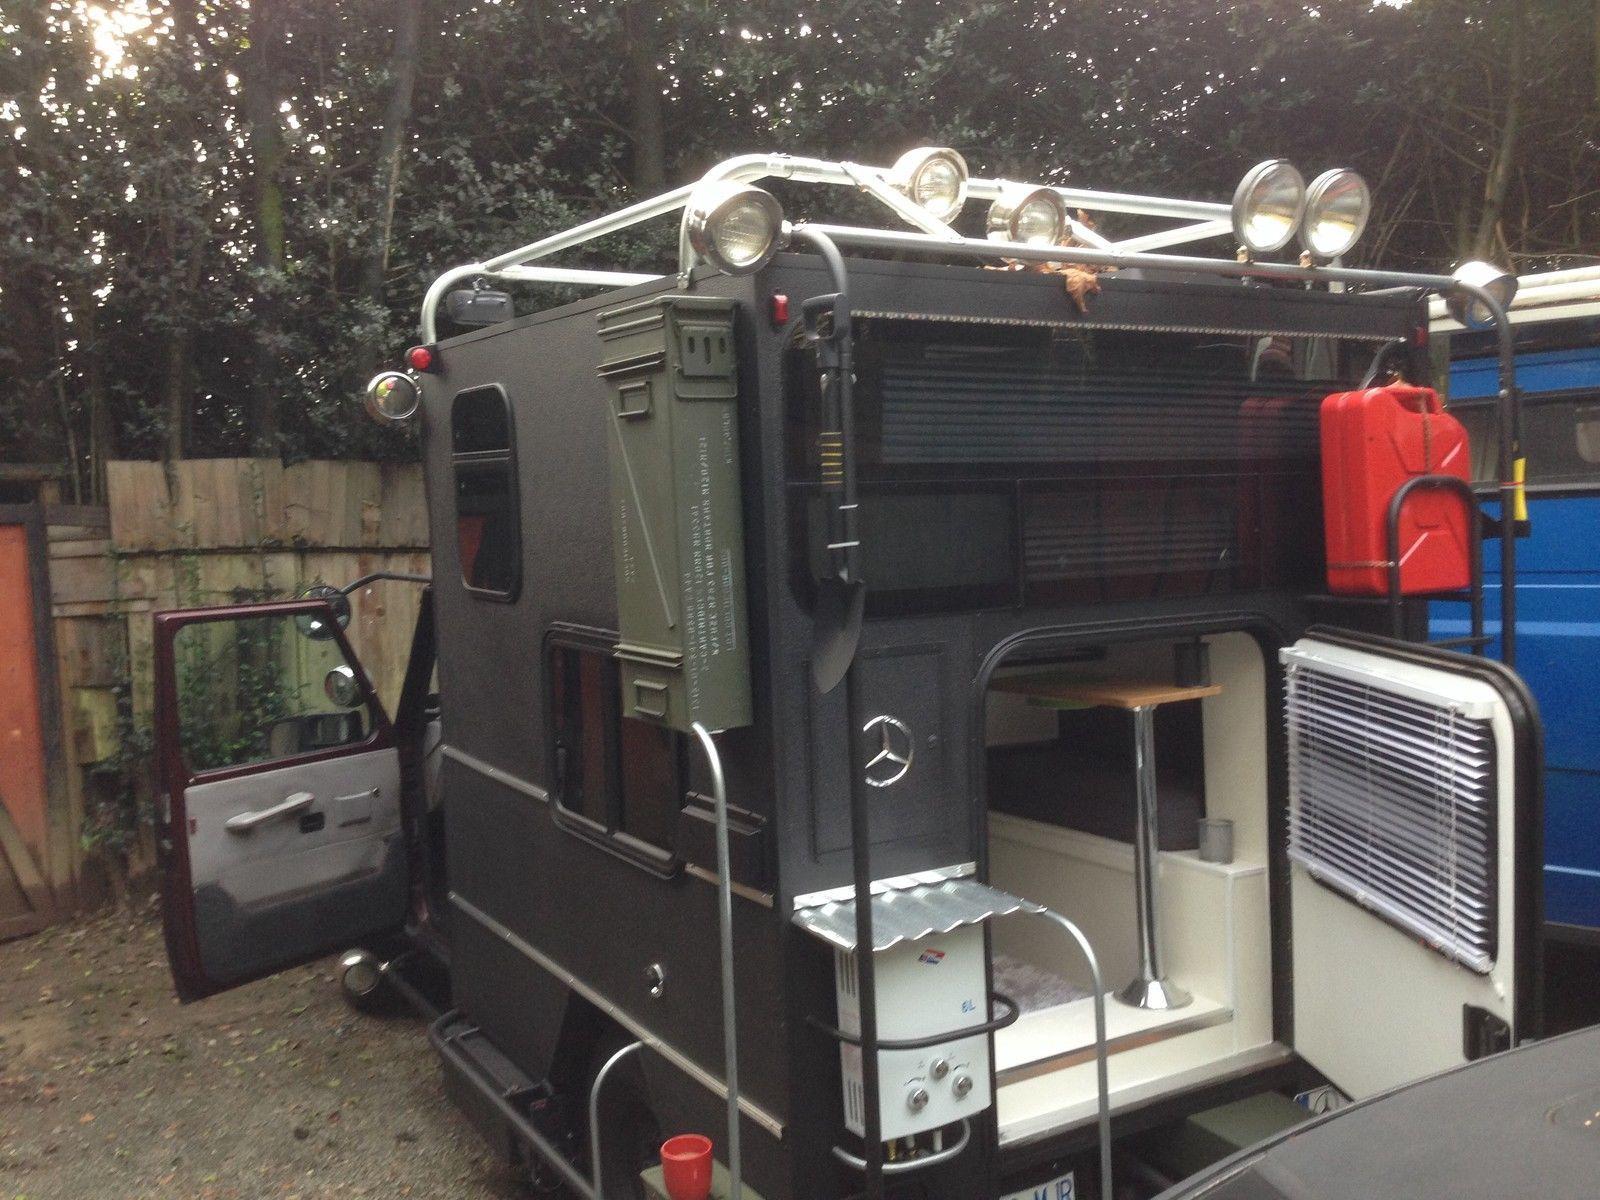 mercedes benz g class motorhome rv 4x4 g wagon expedition. Black Bedroom Furniture Sets. Home Design Ideas